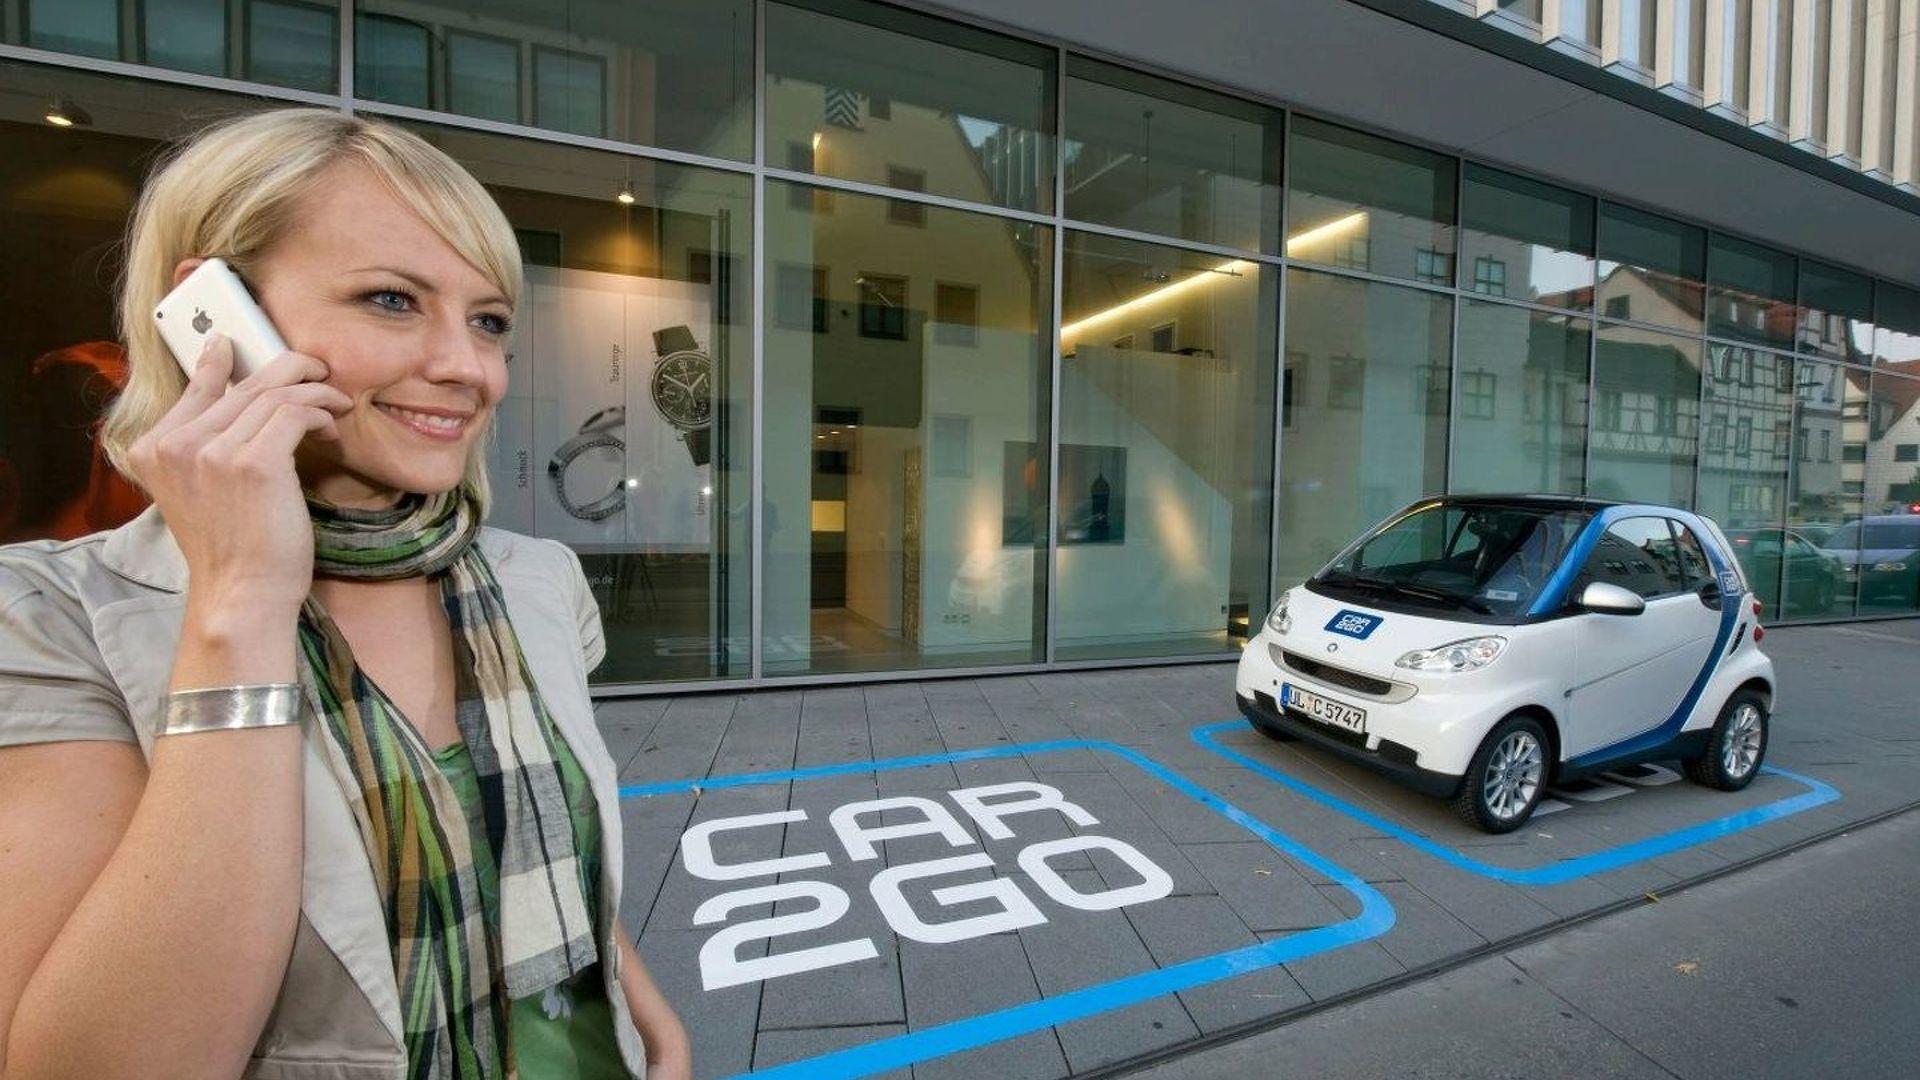 Car2go finds huge customer base waiting in China